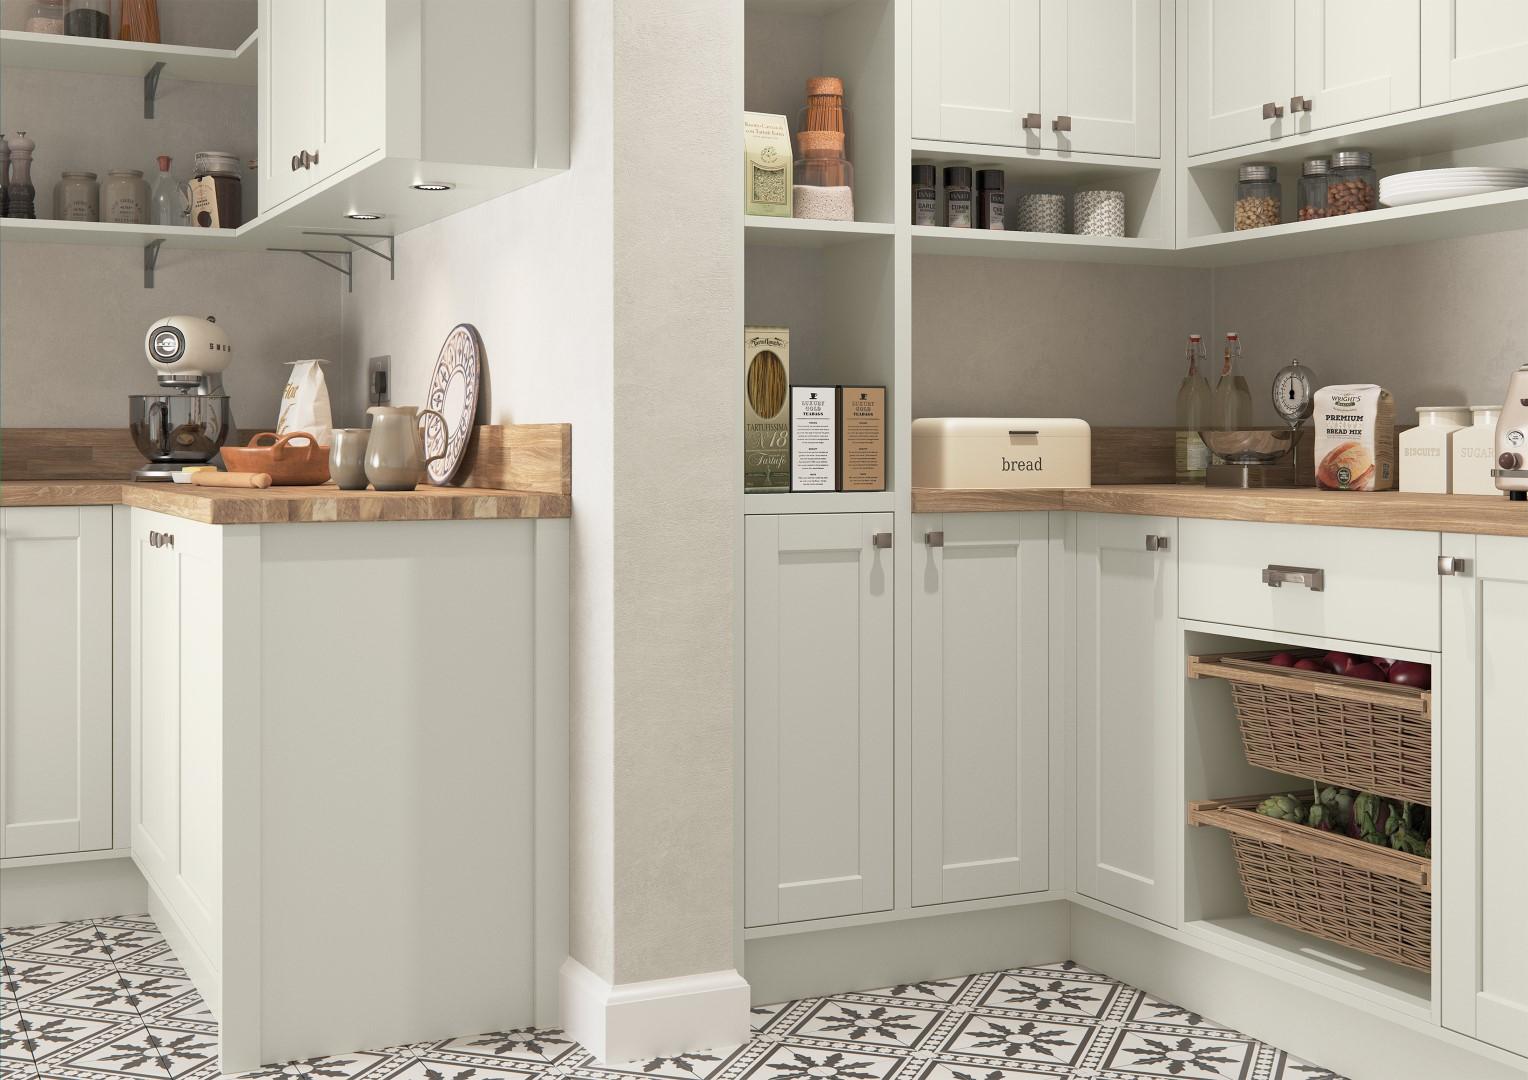 Dawson Porcelain and Cashmere - Kitchen Design - Alan Kelly Kitchens - Waterford - 2